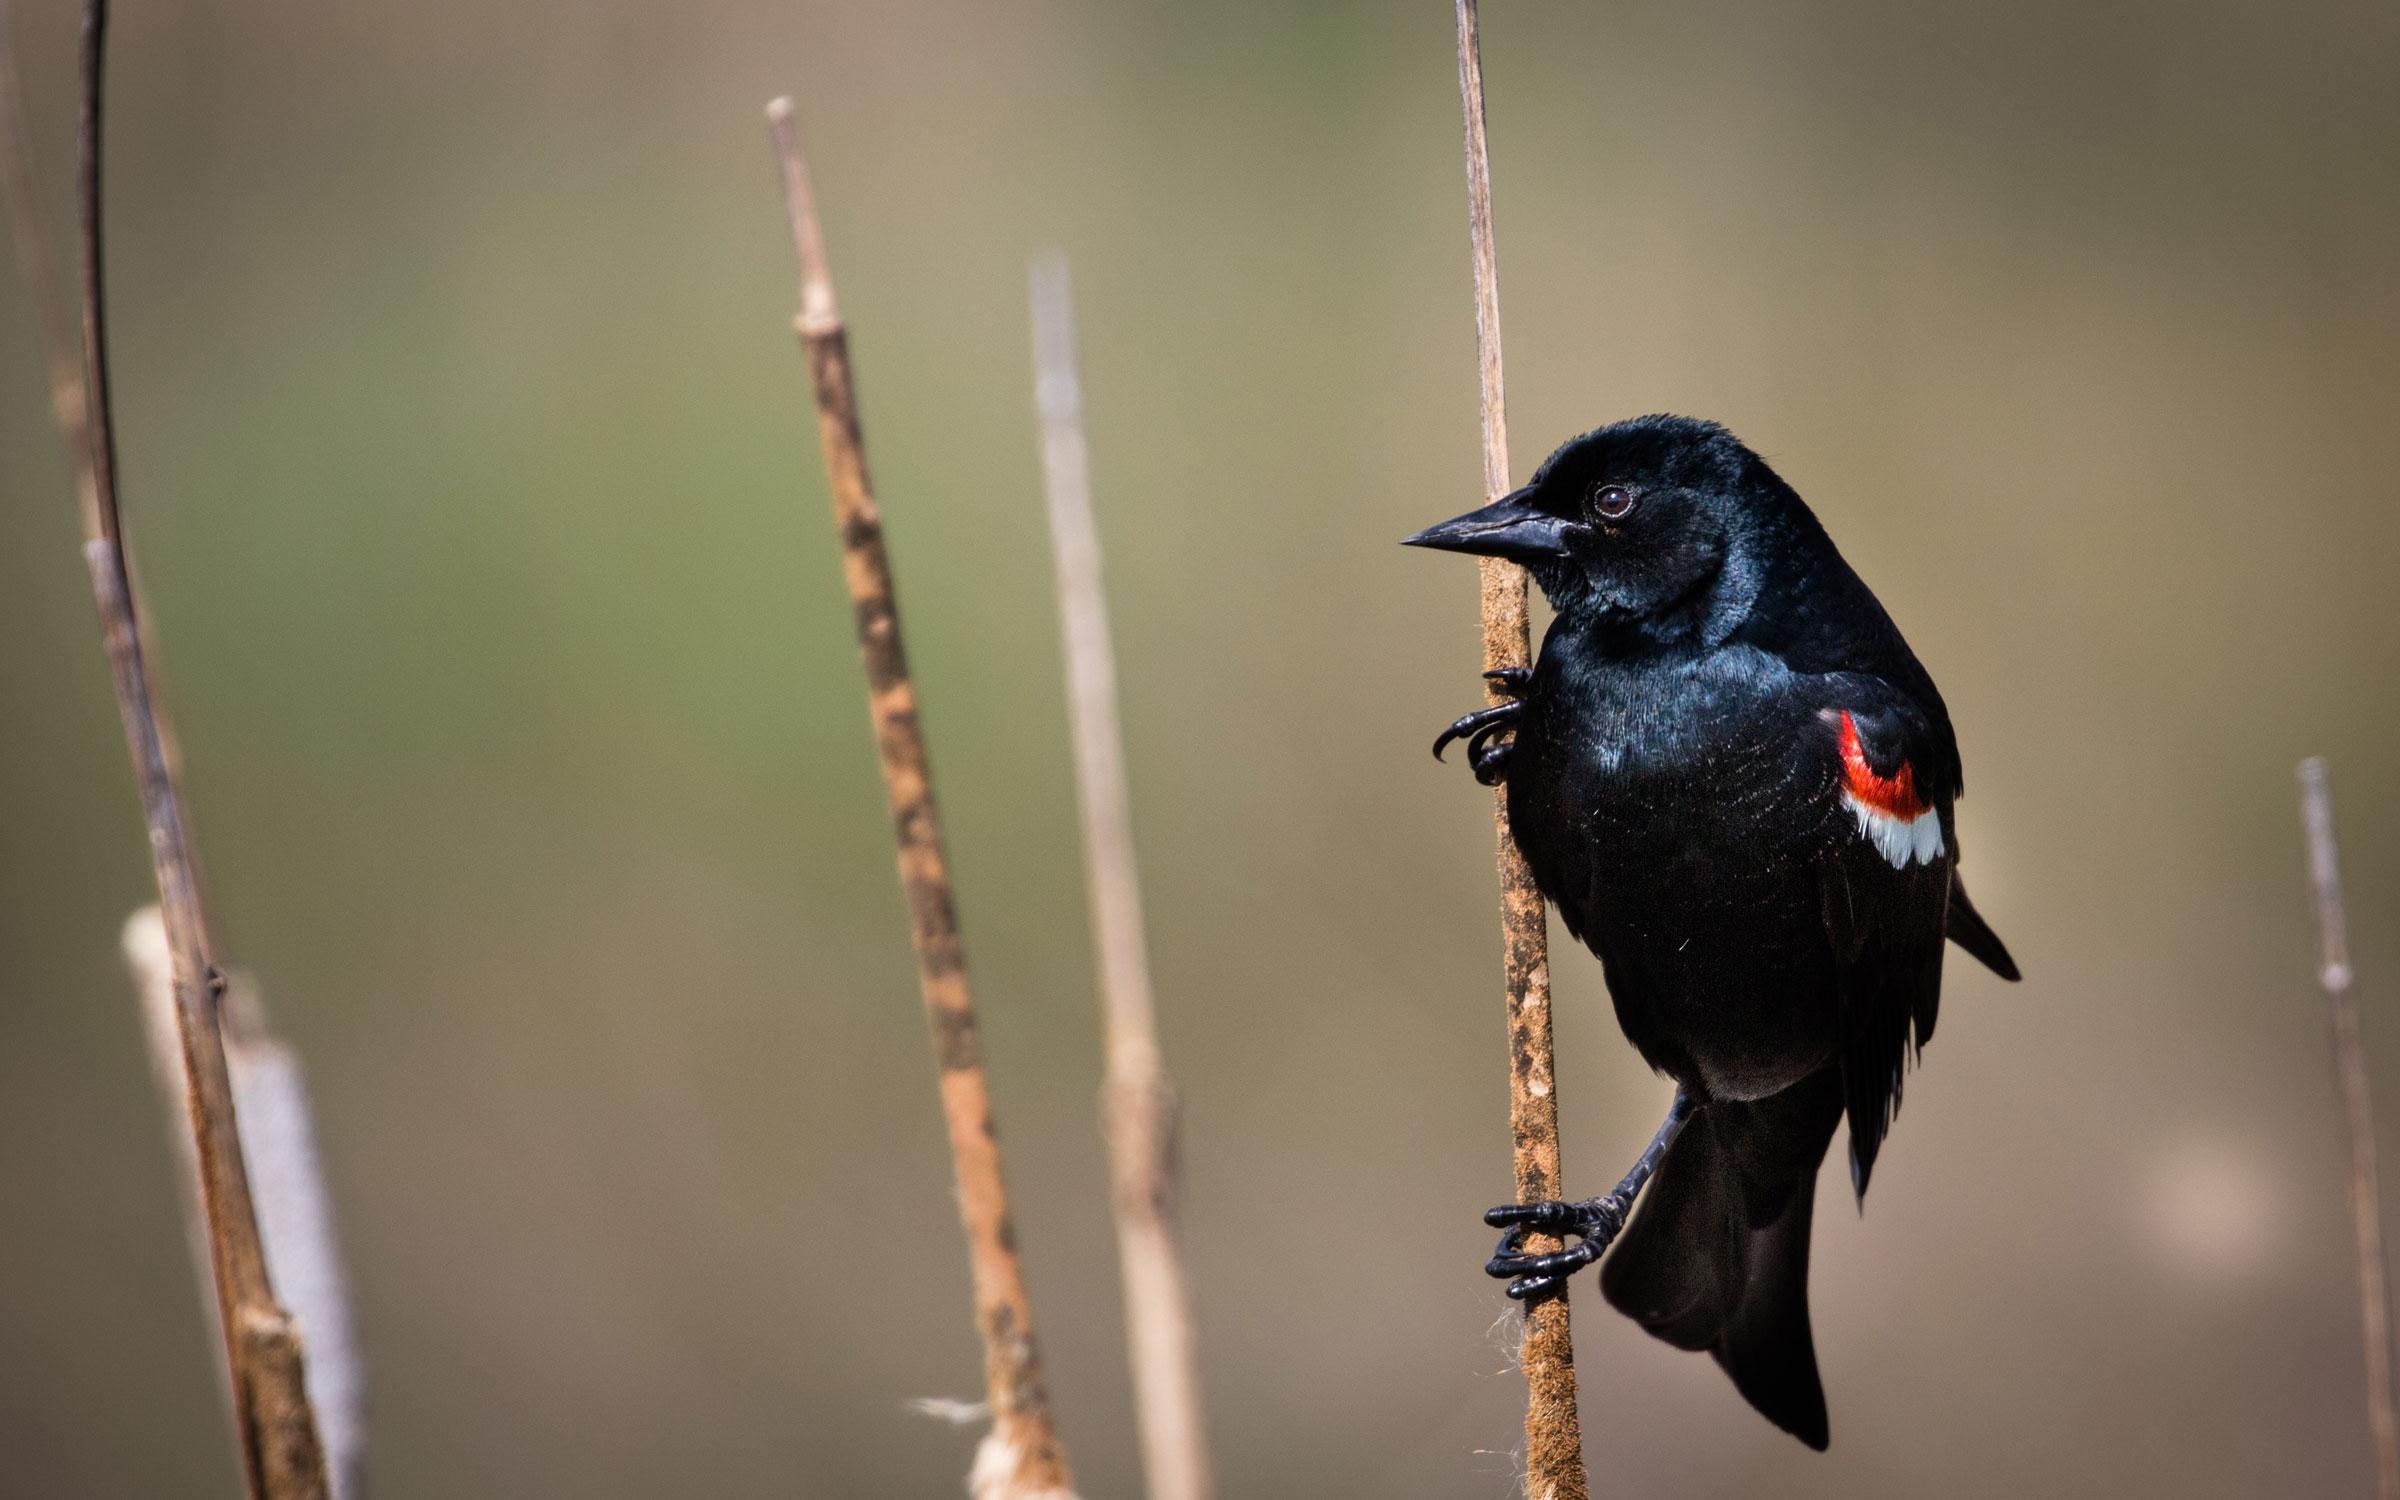 Around 95 percent of the world's Tricolored Blackbird live in California, putting the species population at around 178,000 birds. Jameson Scott